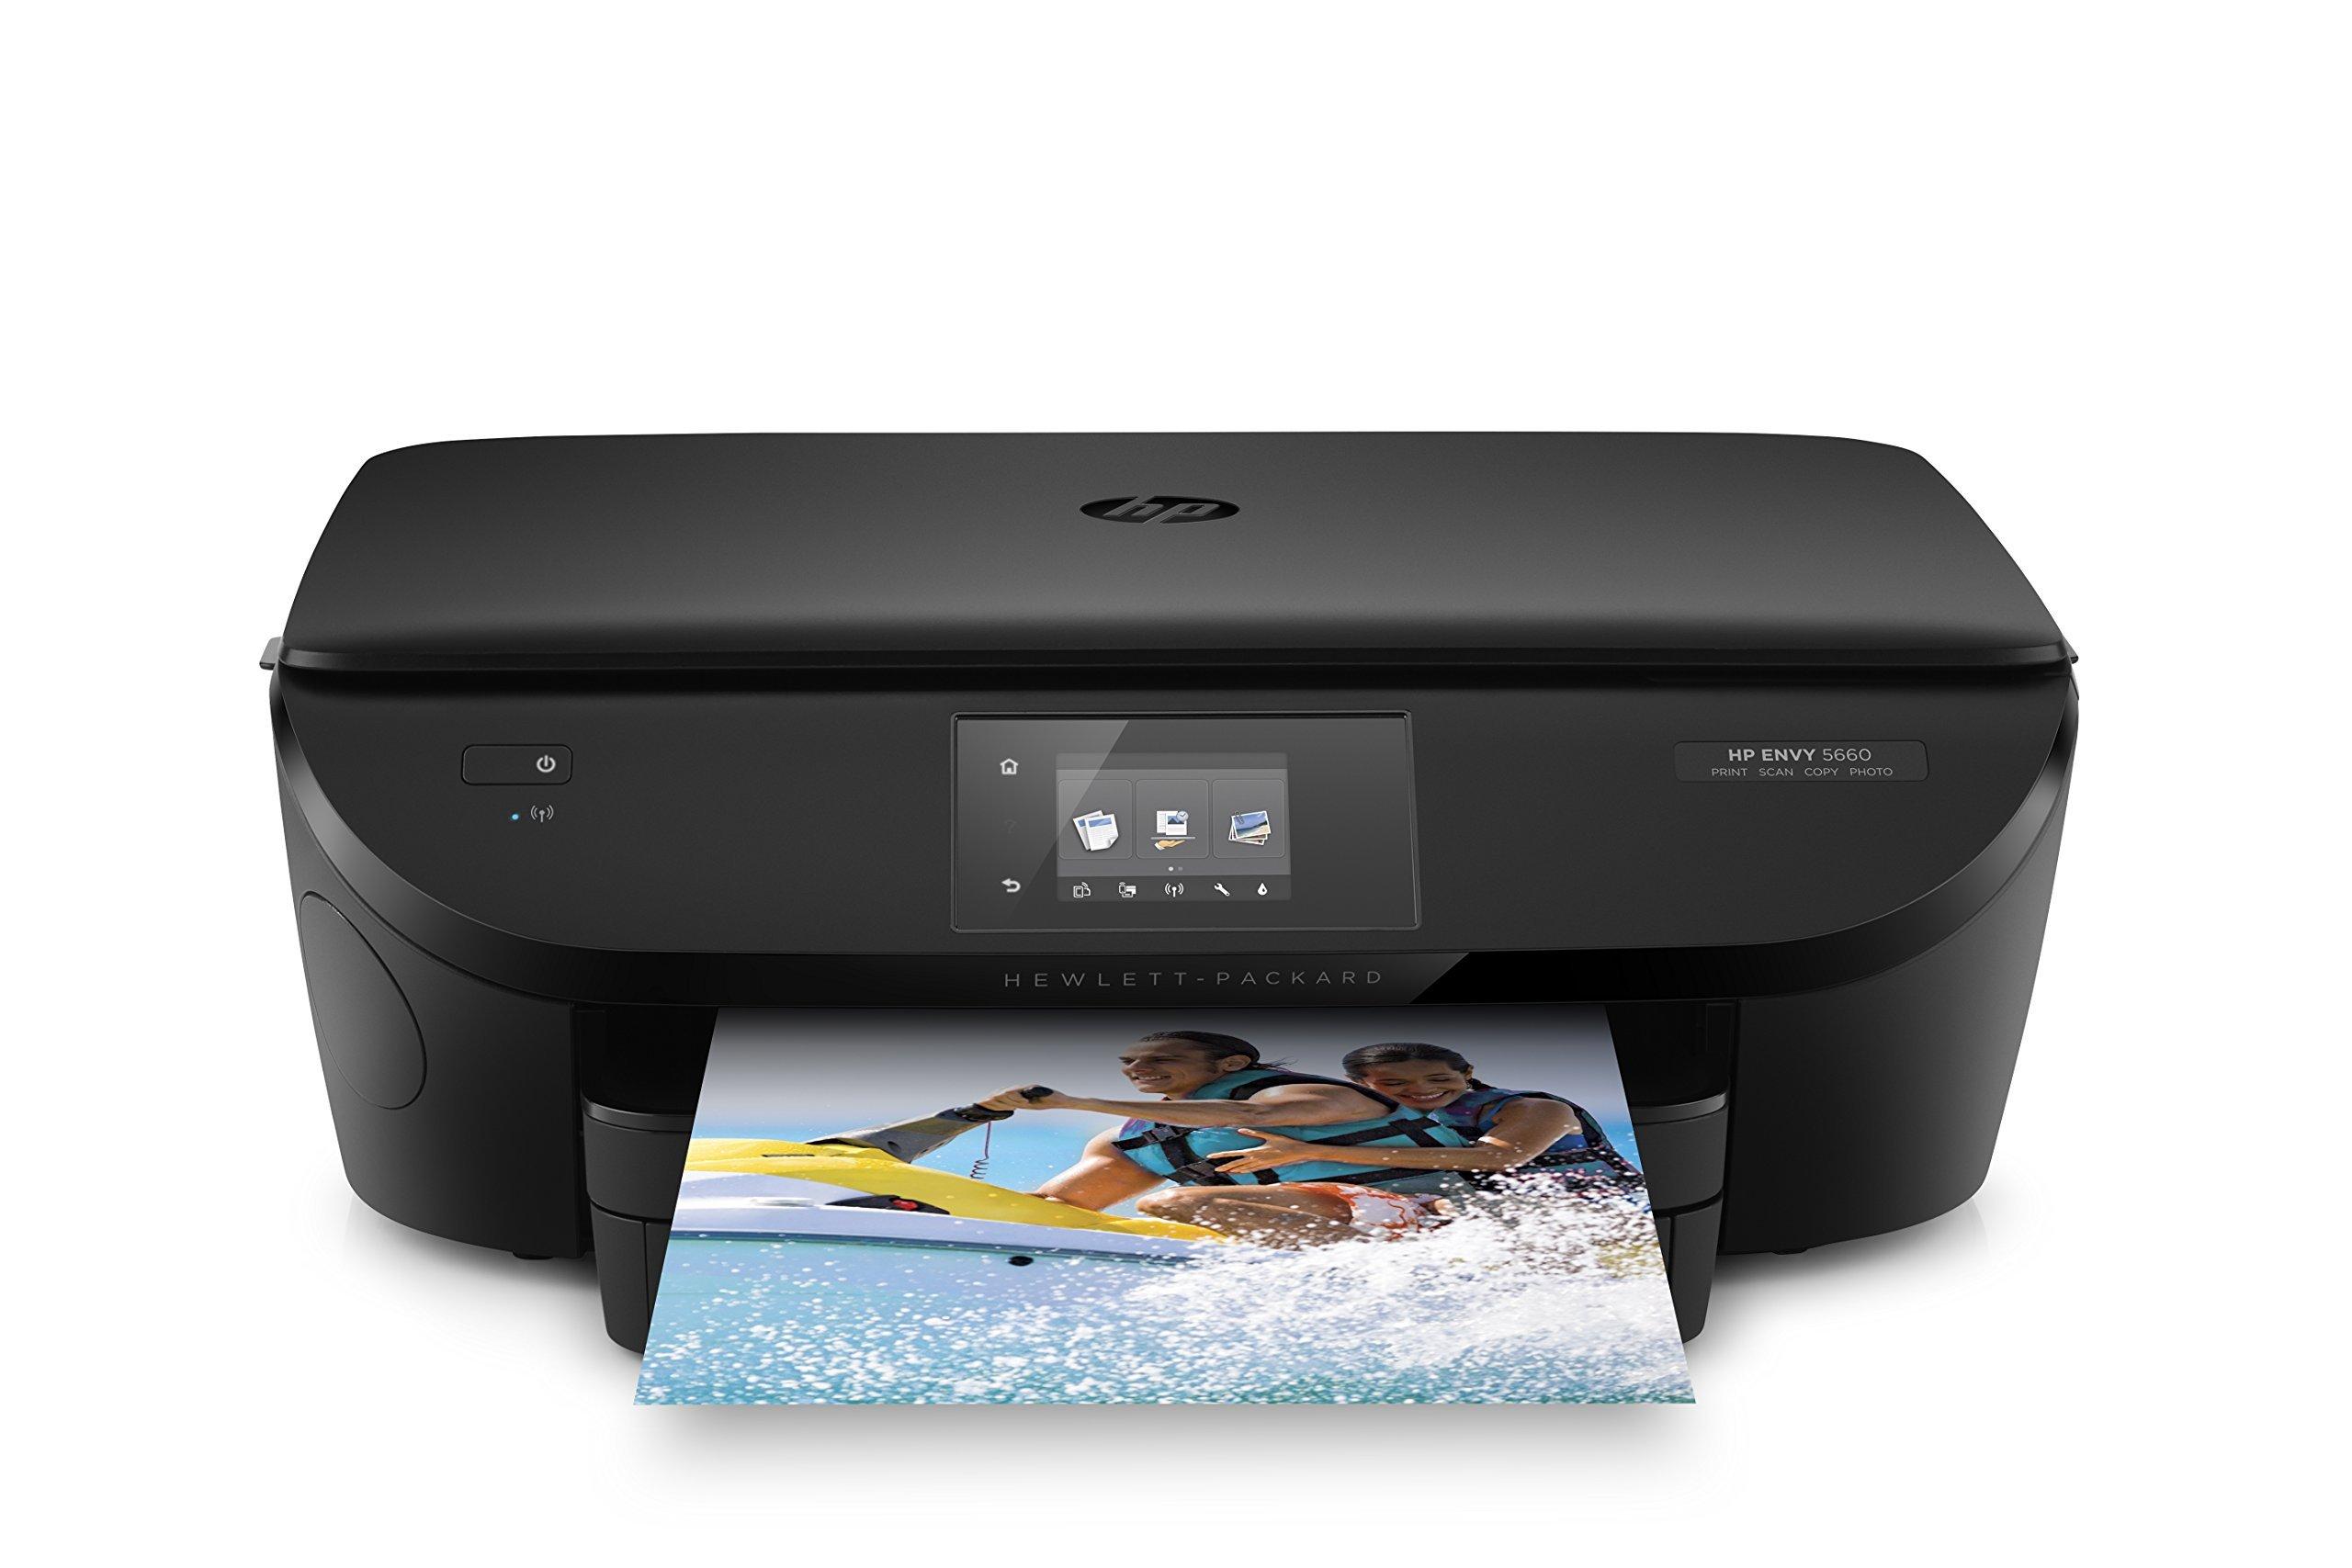 HP F8B04A ENVY 5660 e-All-in-One Printer, Black (Certified Refurbished)